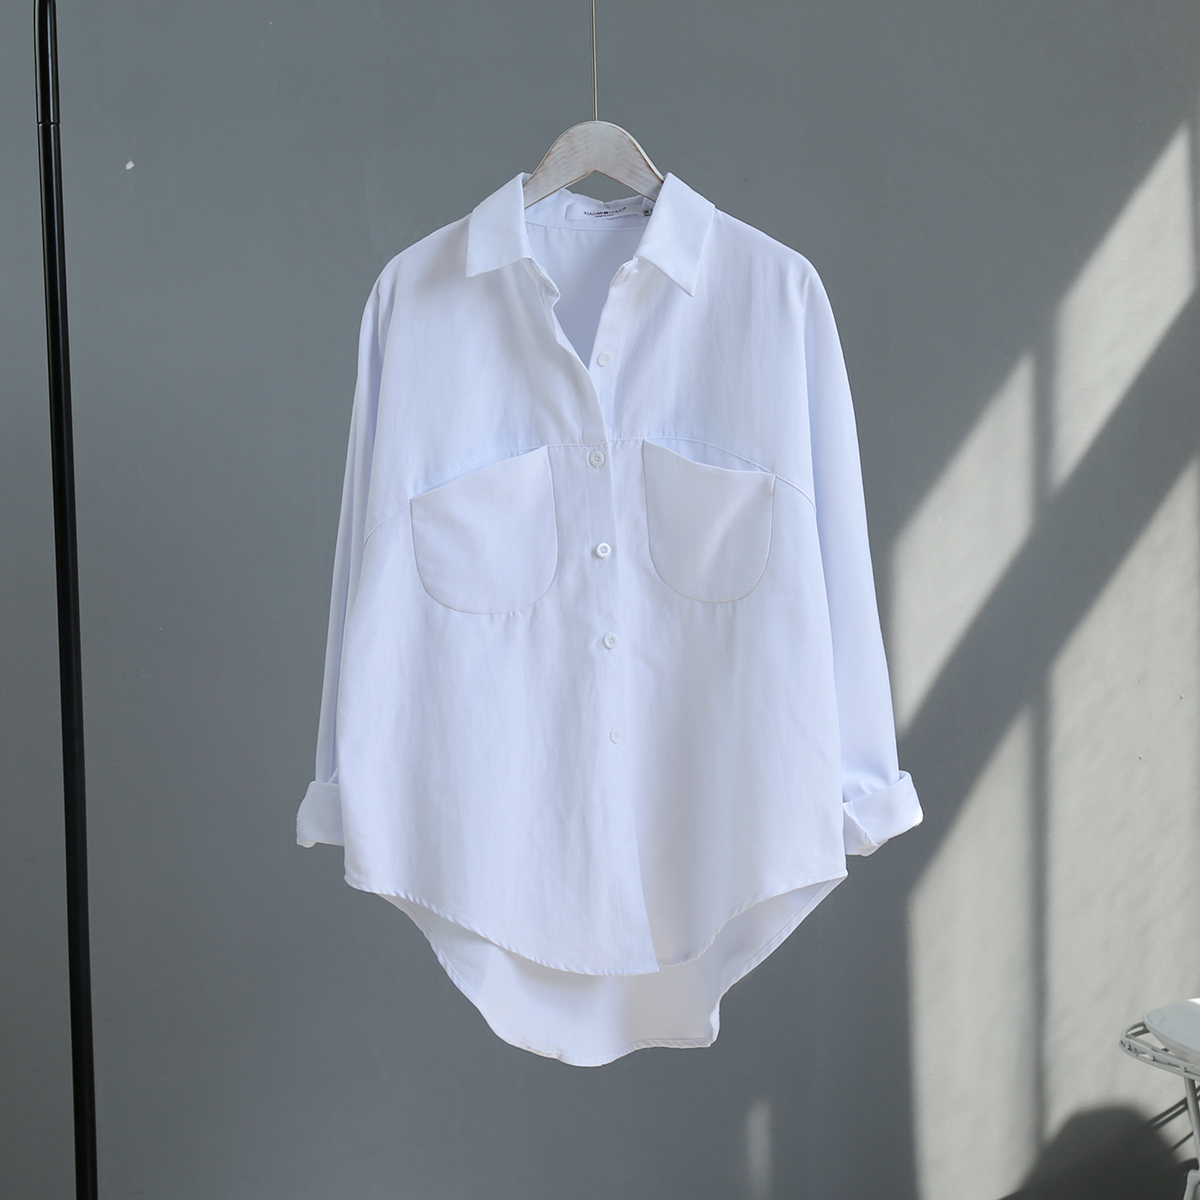 Blouse Korean Long Sleeve Tops And Blouses Vintage Women Shirts 12